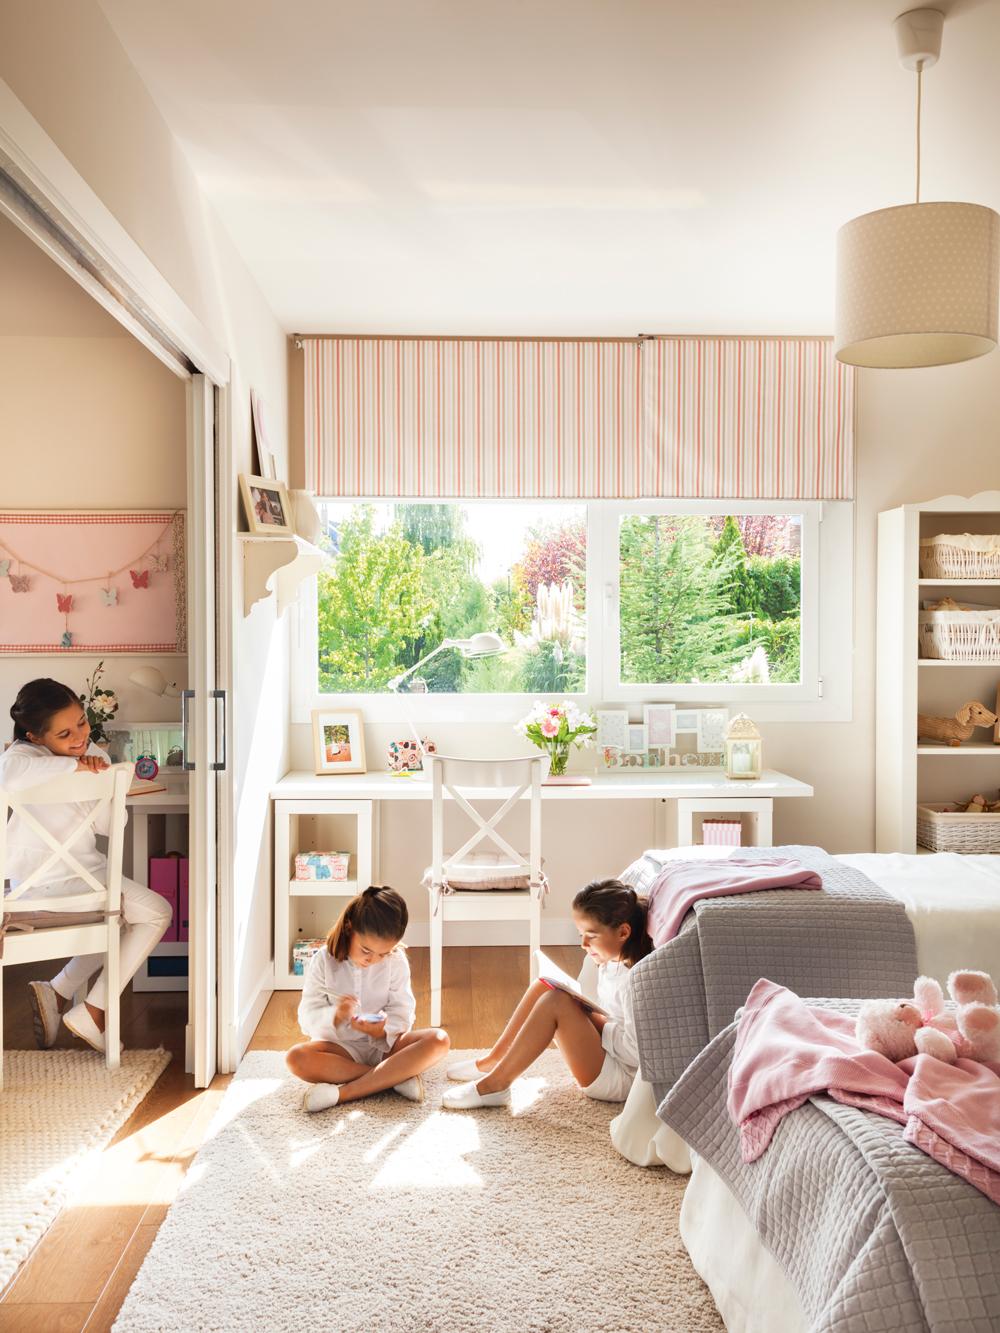 10 ideas para decorar la habitaci n infantil perfecta - Ver habitaciones infantiles ...